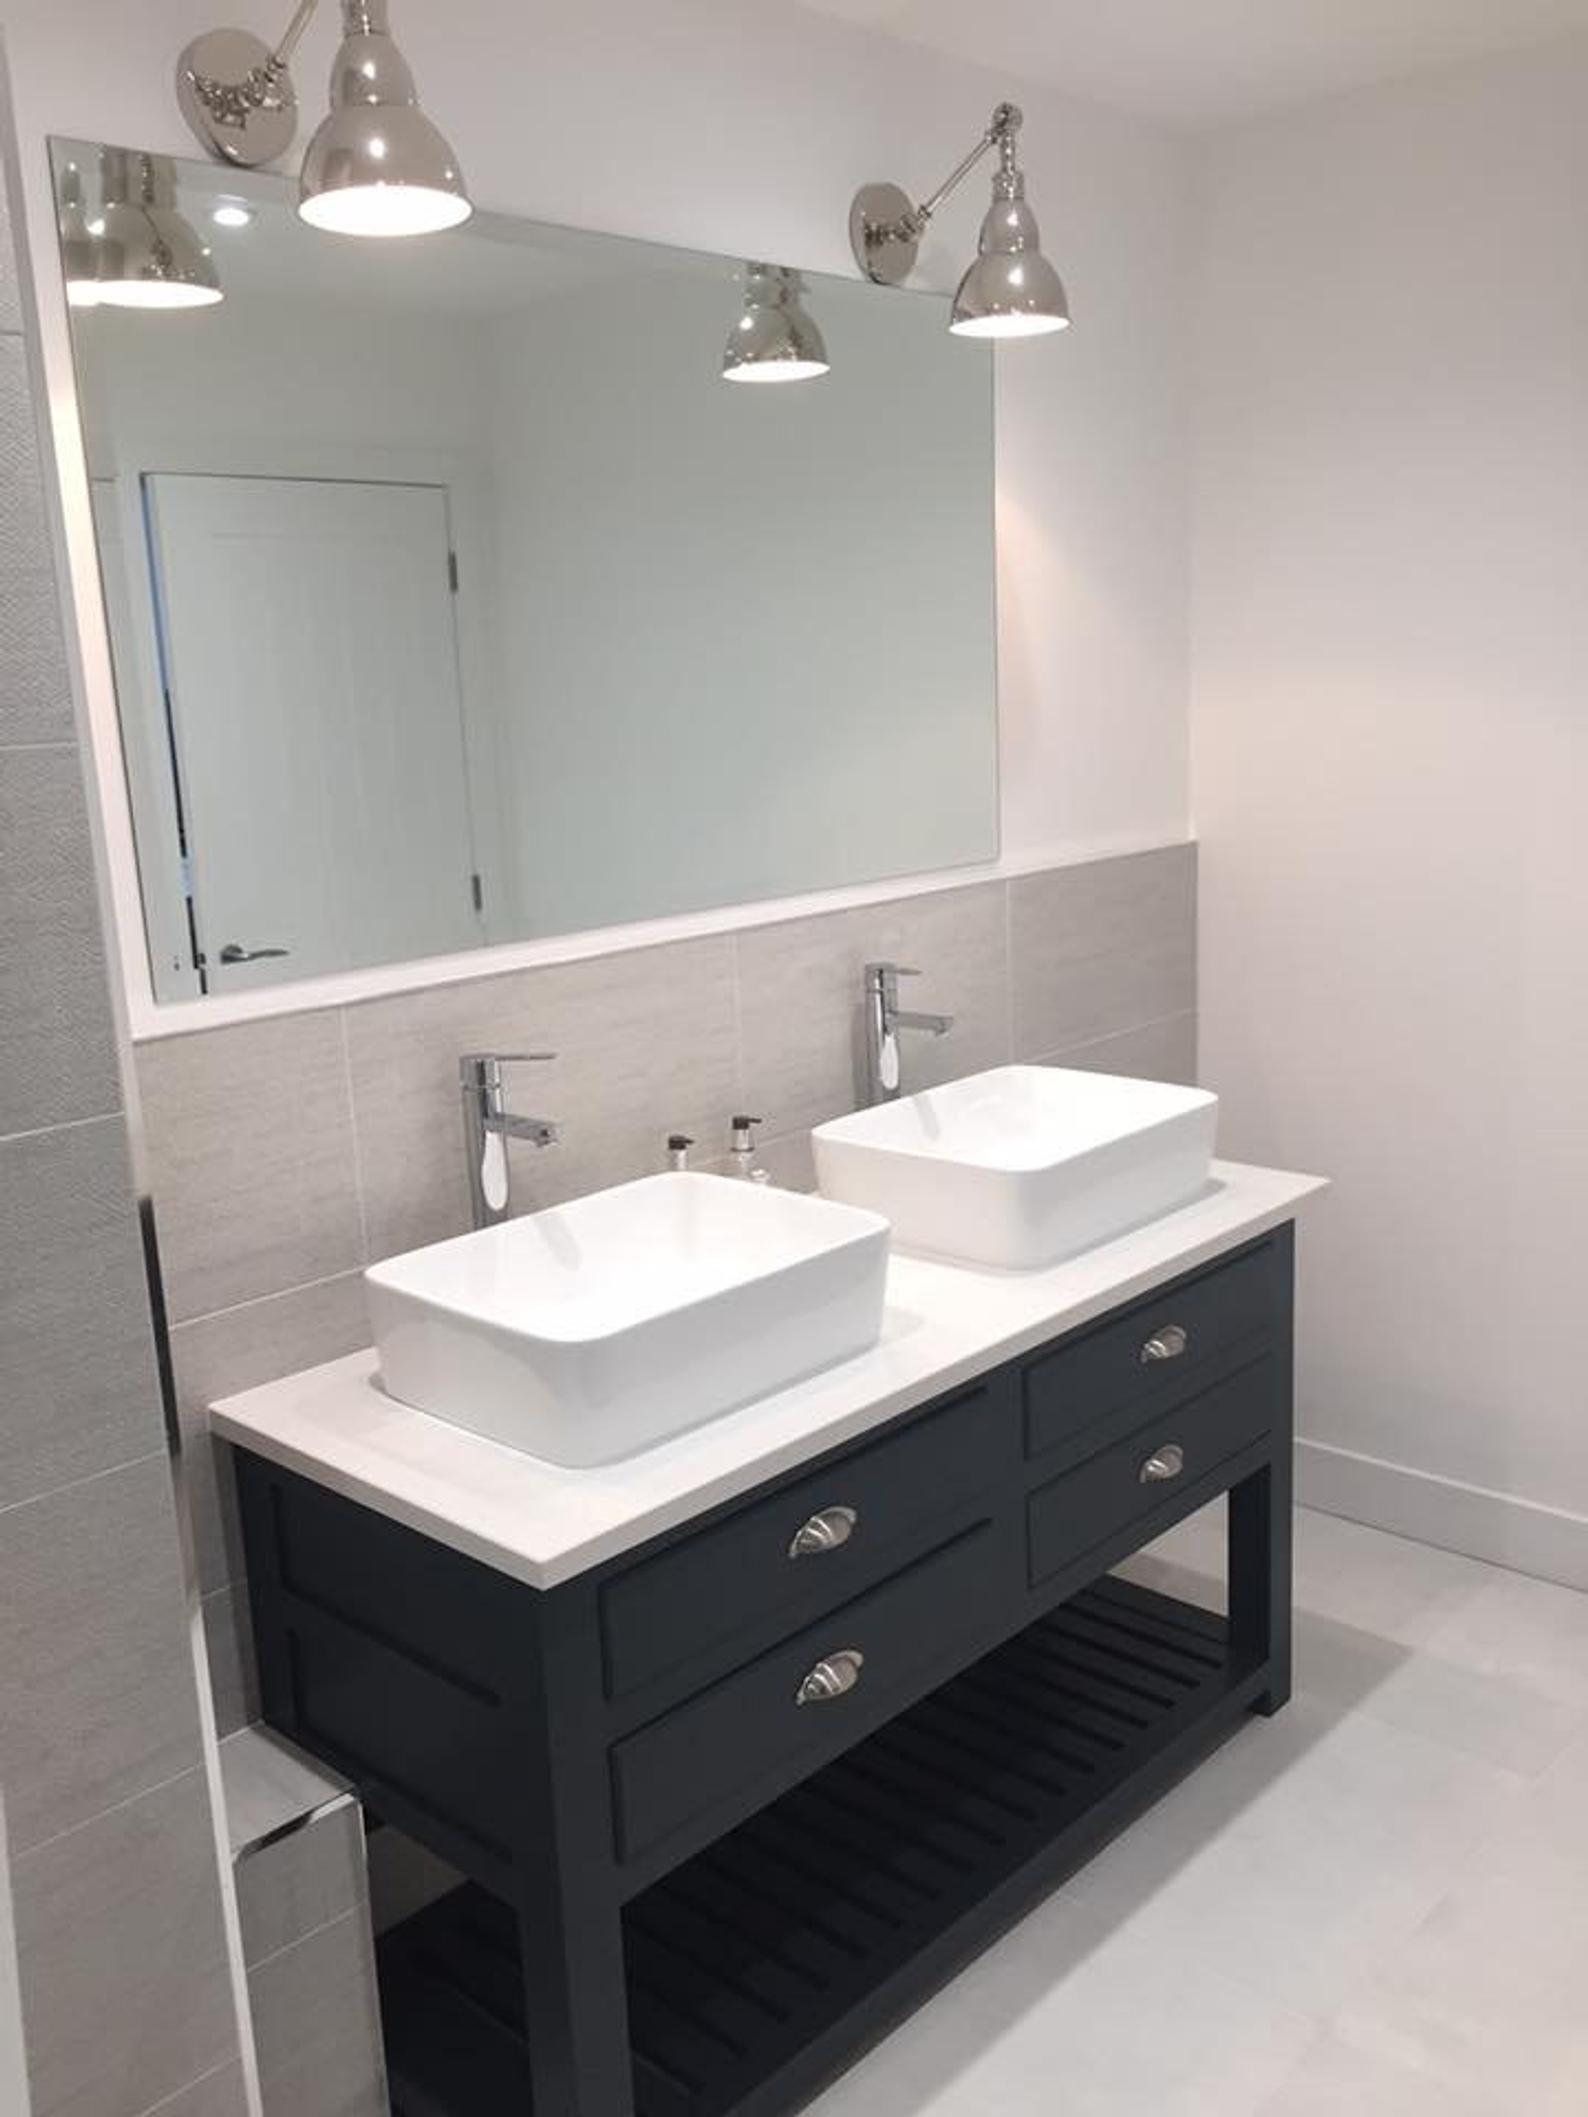 Bespoke Bathroom Vanity Unit With A Quartz Worktop Made To Order